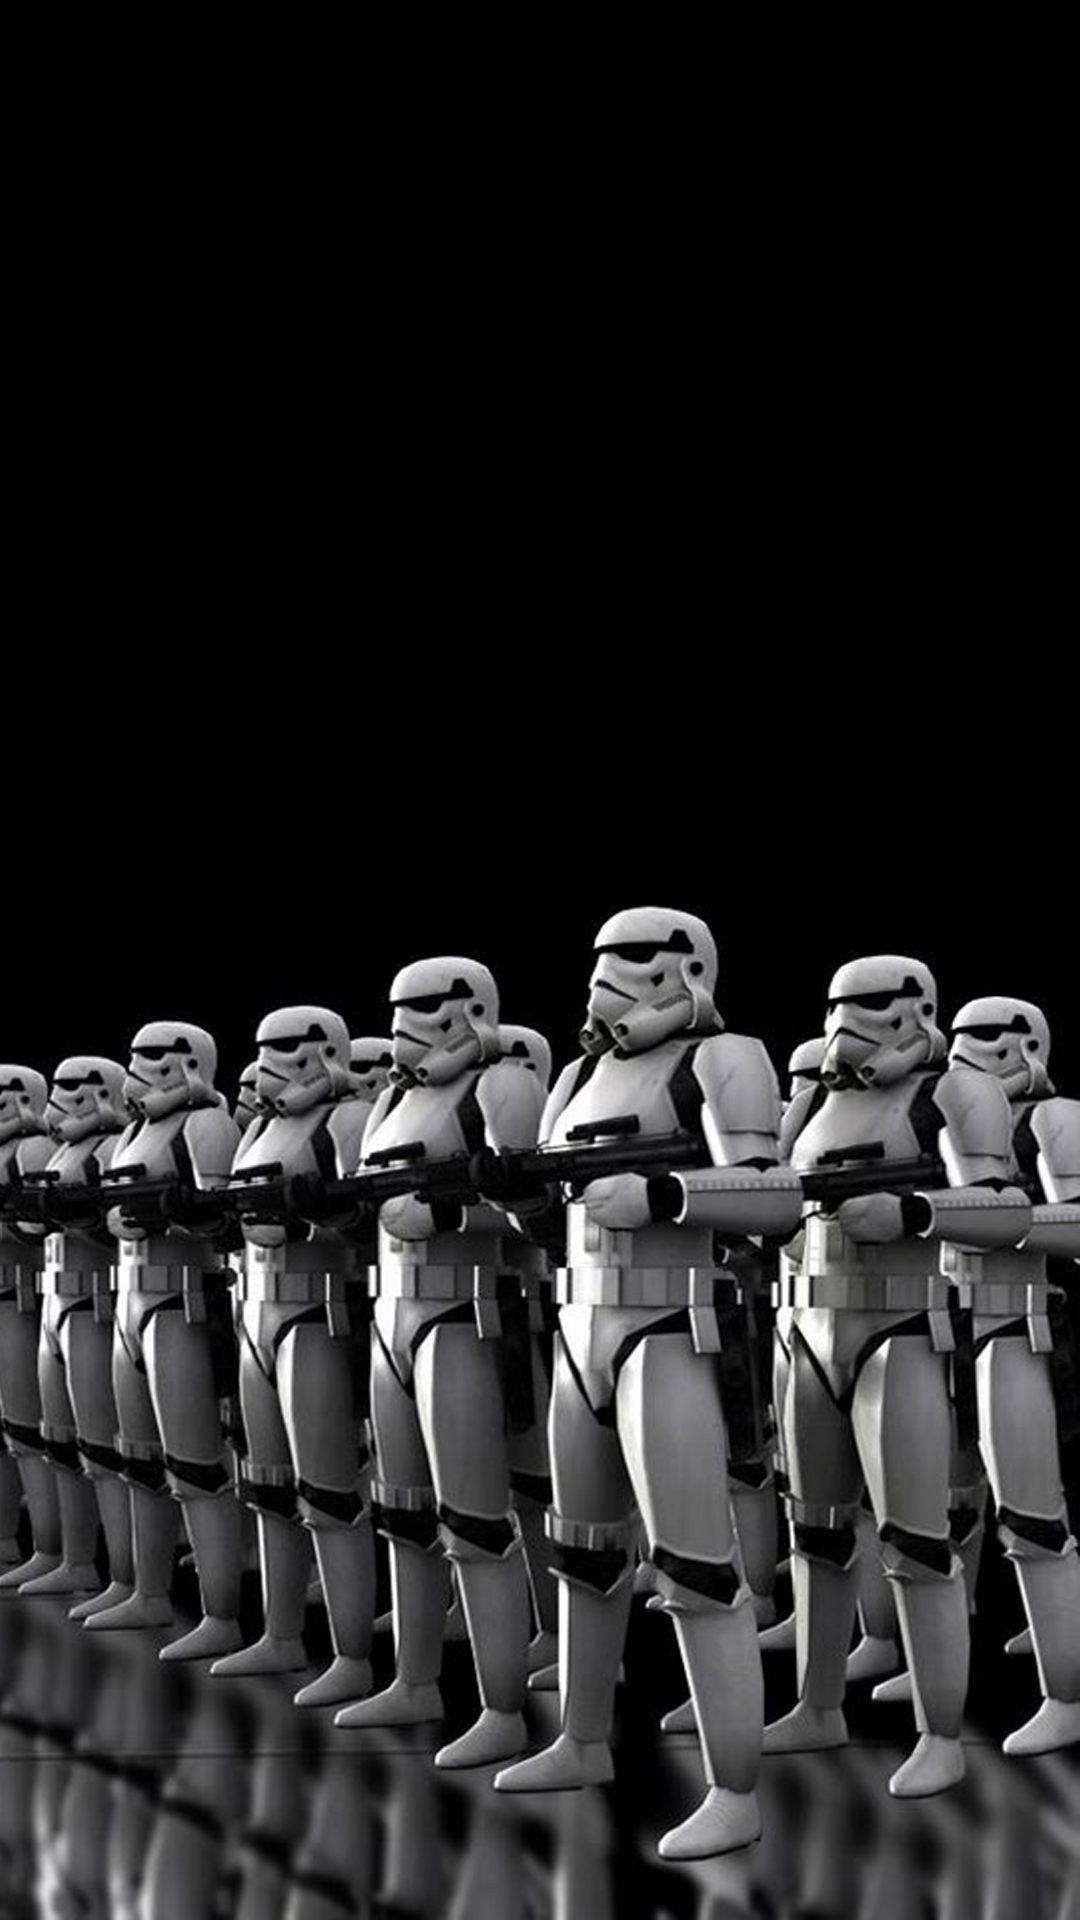 Star Wars Iphone Wallpaper image gallery 1080x1920